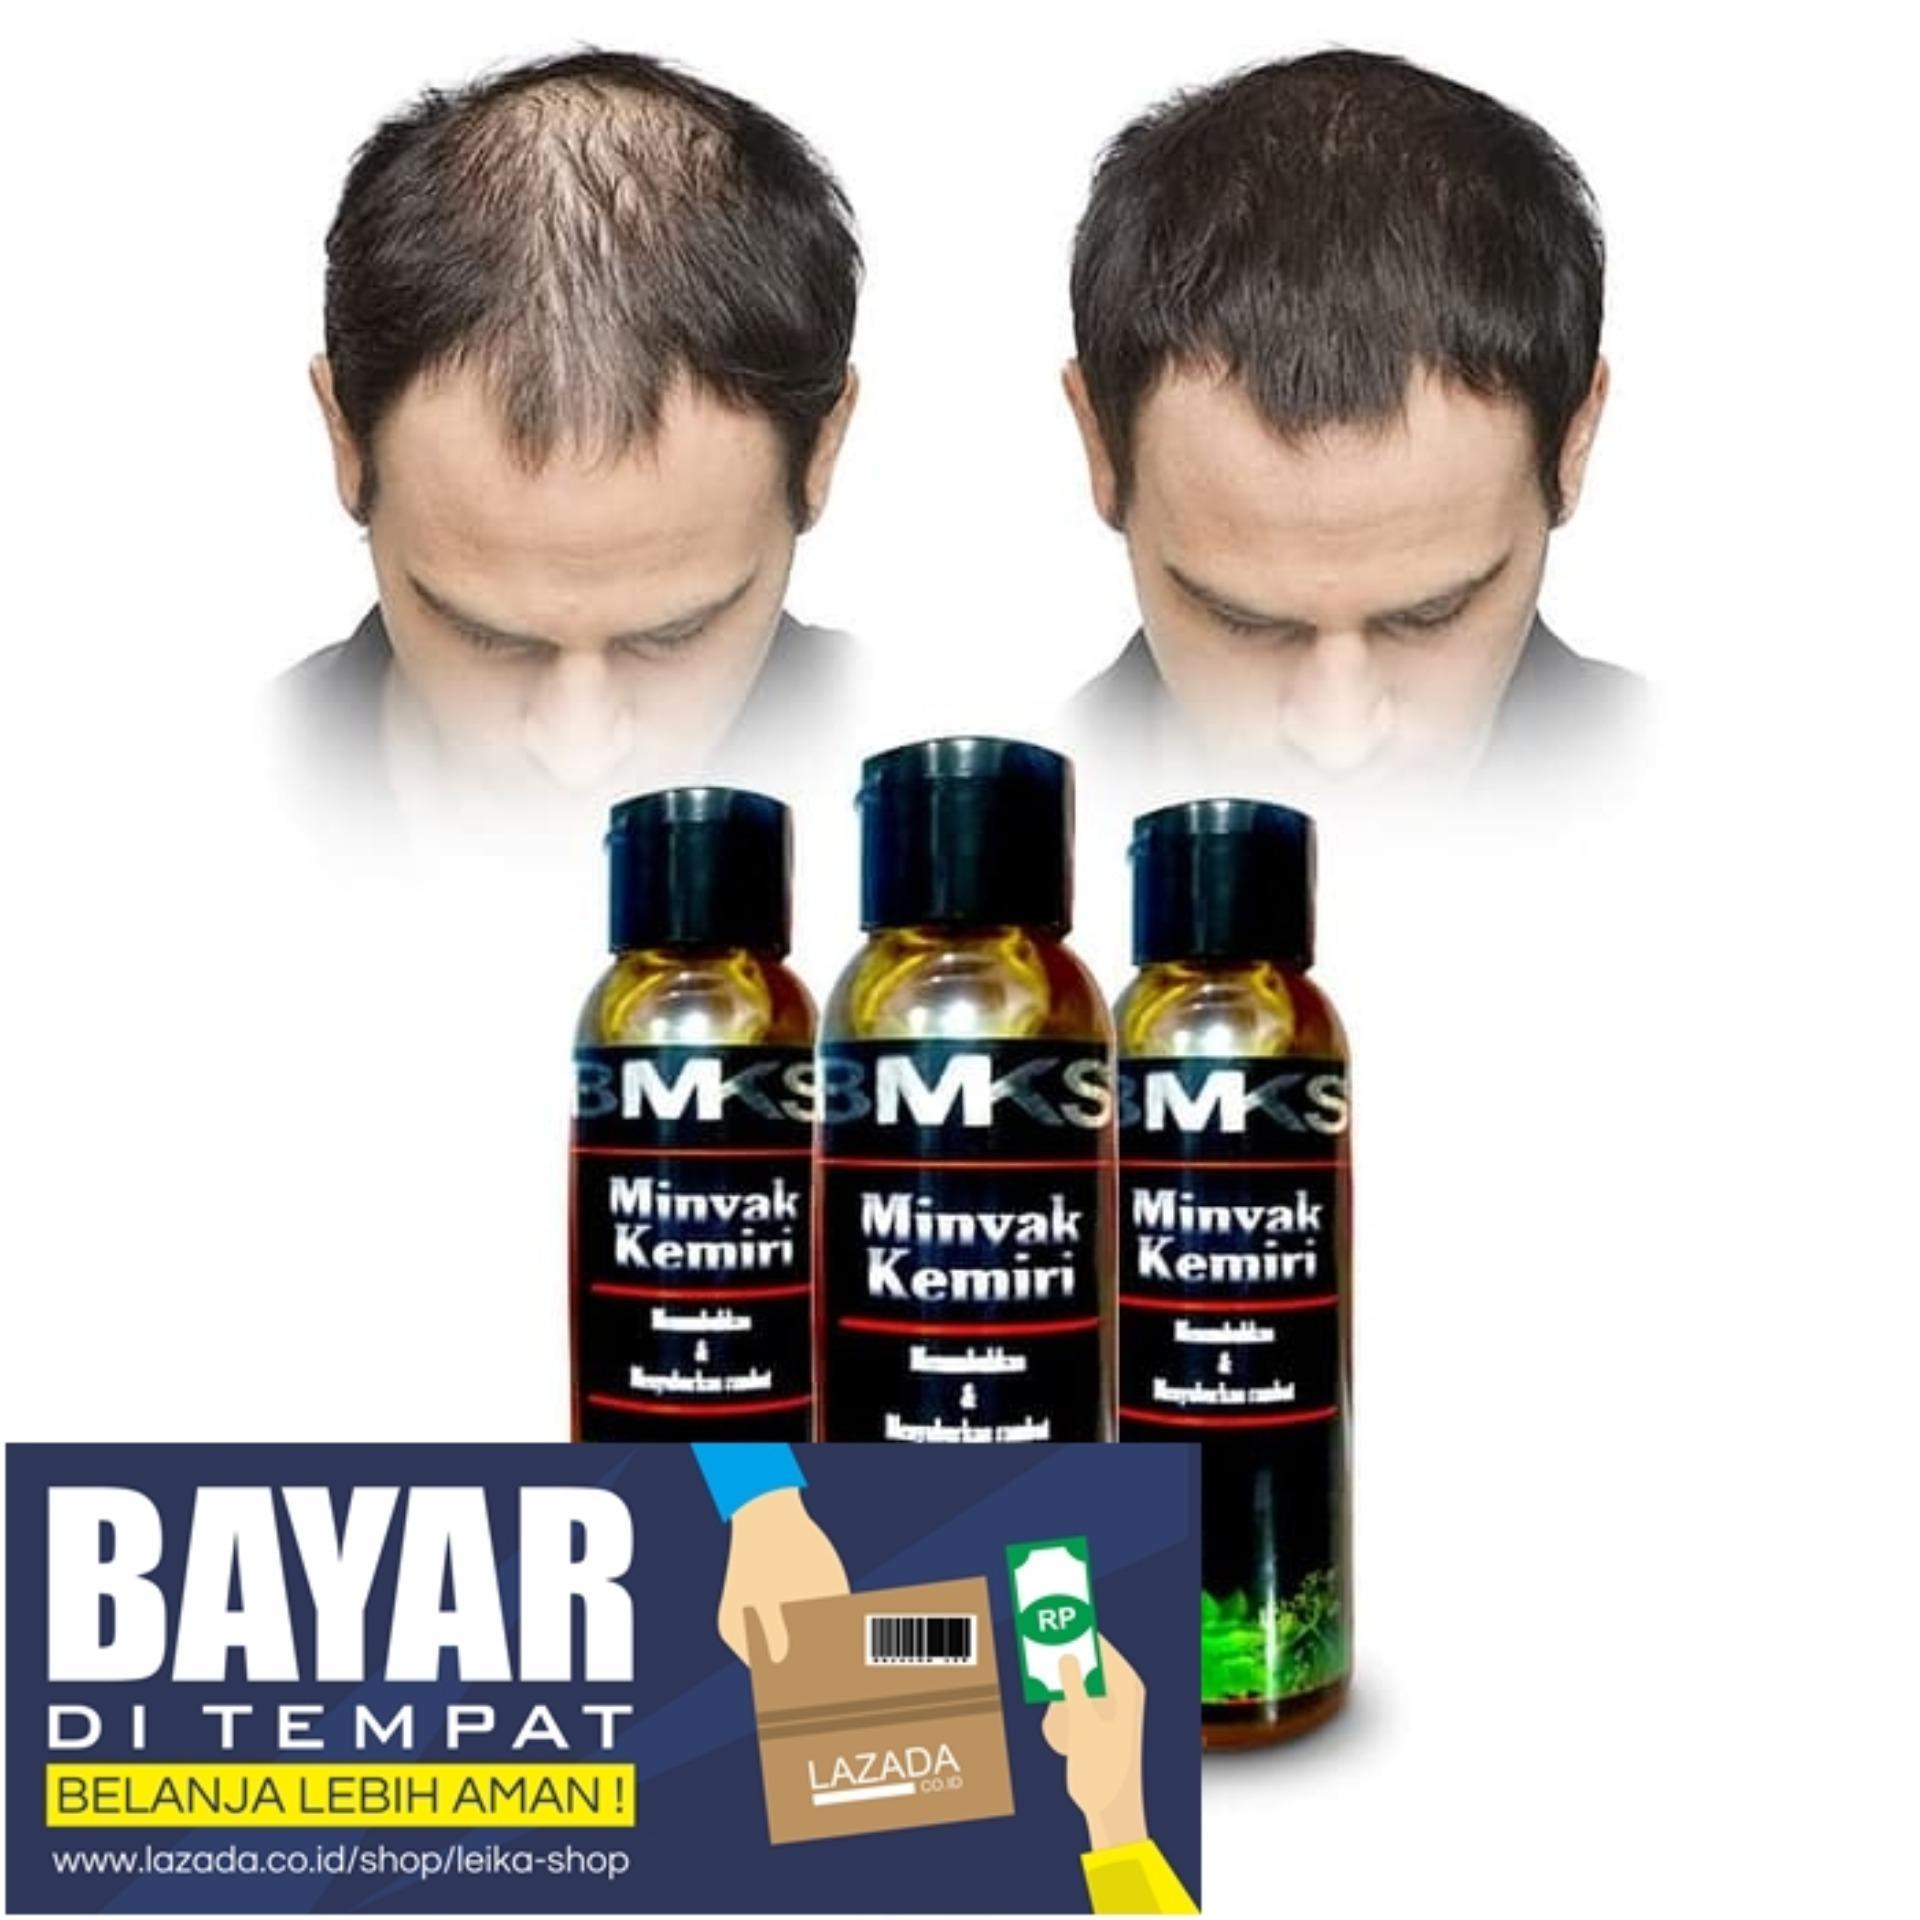 Minyak Kemiri Asli Original 100% BMKS BPOM / Minyak Kemiri Penumbuh Rambut Minyak Kemiri Untuk